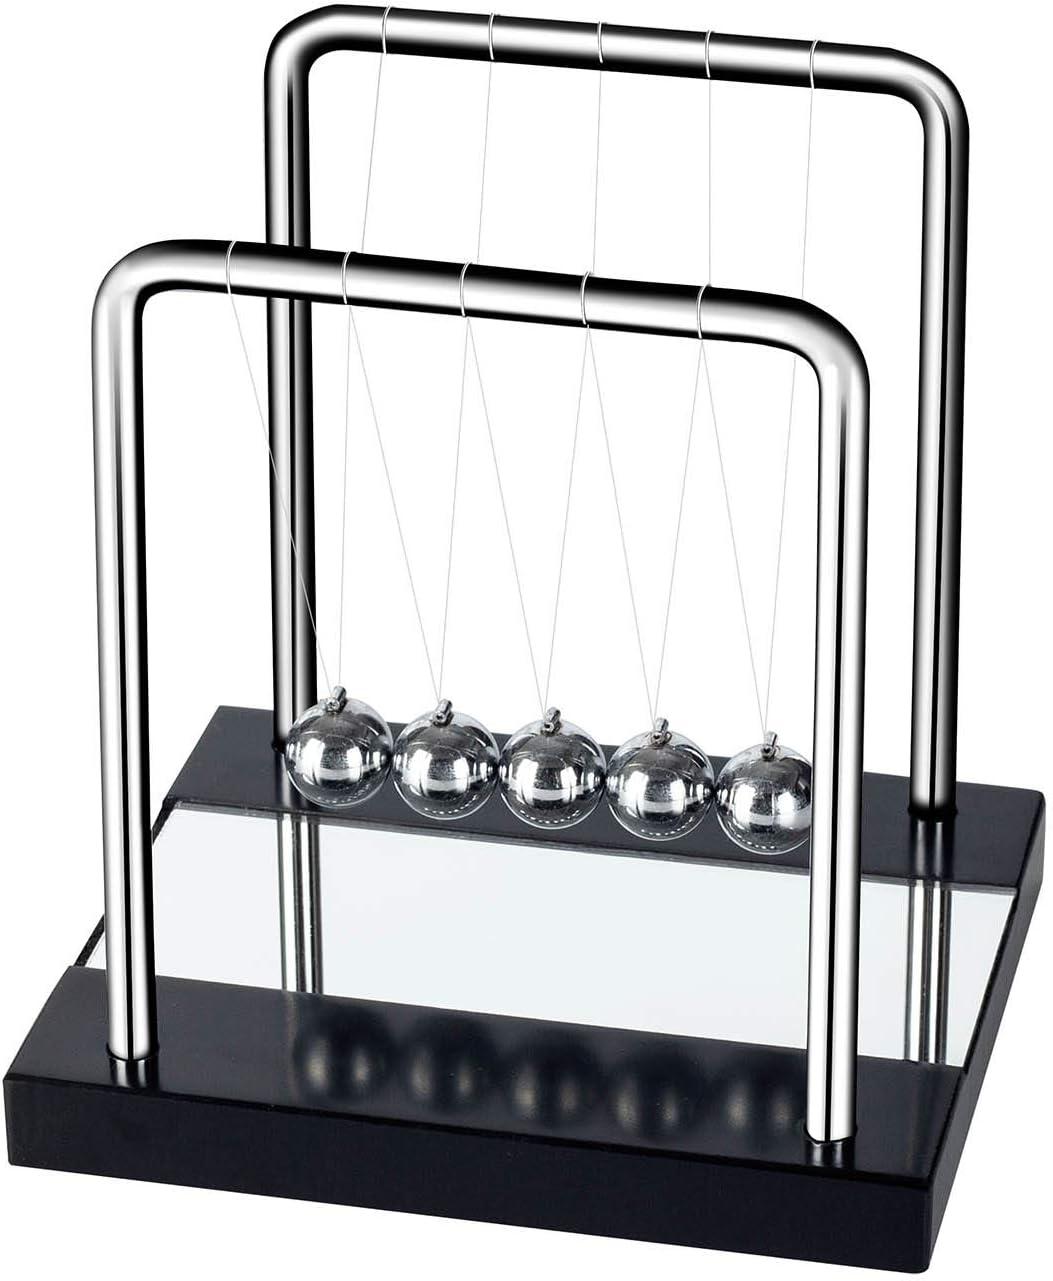 DOTSOG Newton's Cradle, Desk Table Decor Metal Pendulum Ball Newton Ball Physics Science Pendulum Steel Balance Ball for Office Physics Teacher Toys